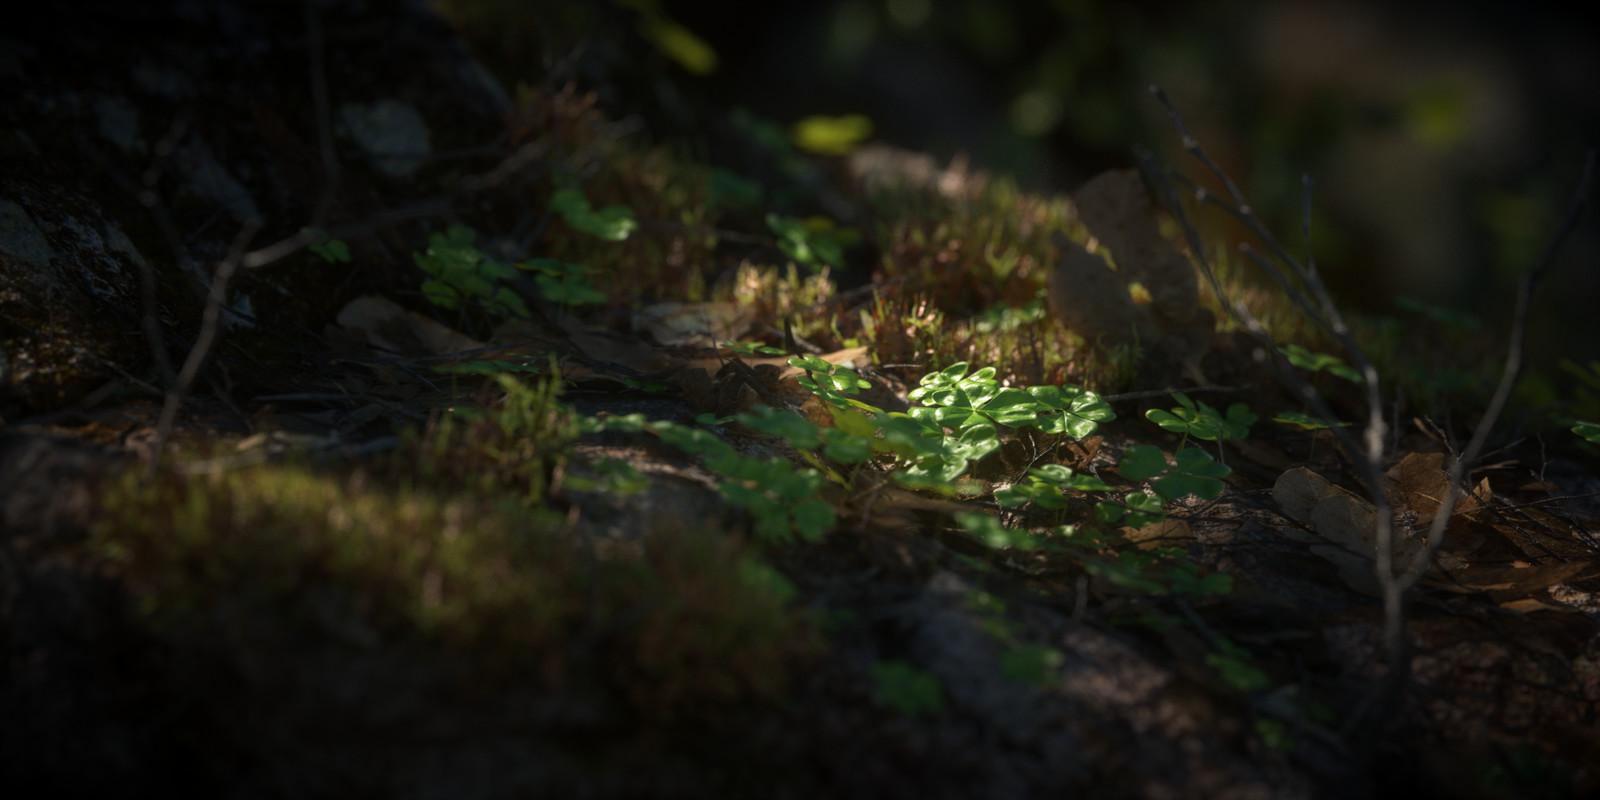 Mossy Rock - Environment Vignette no. 01